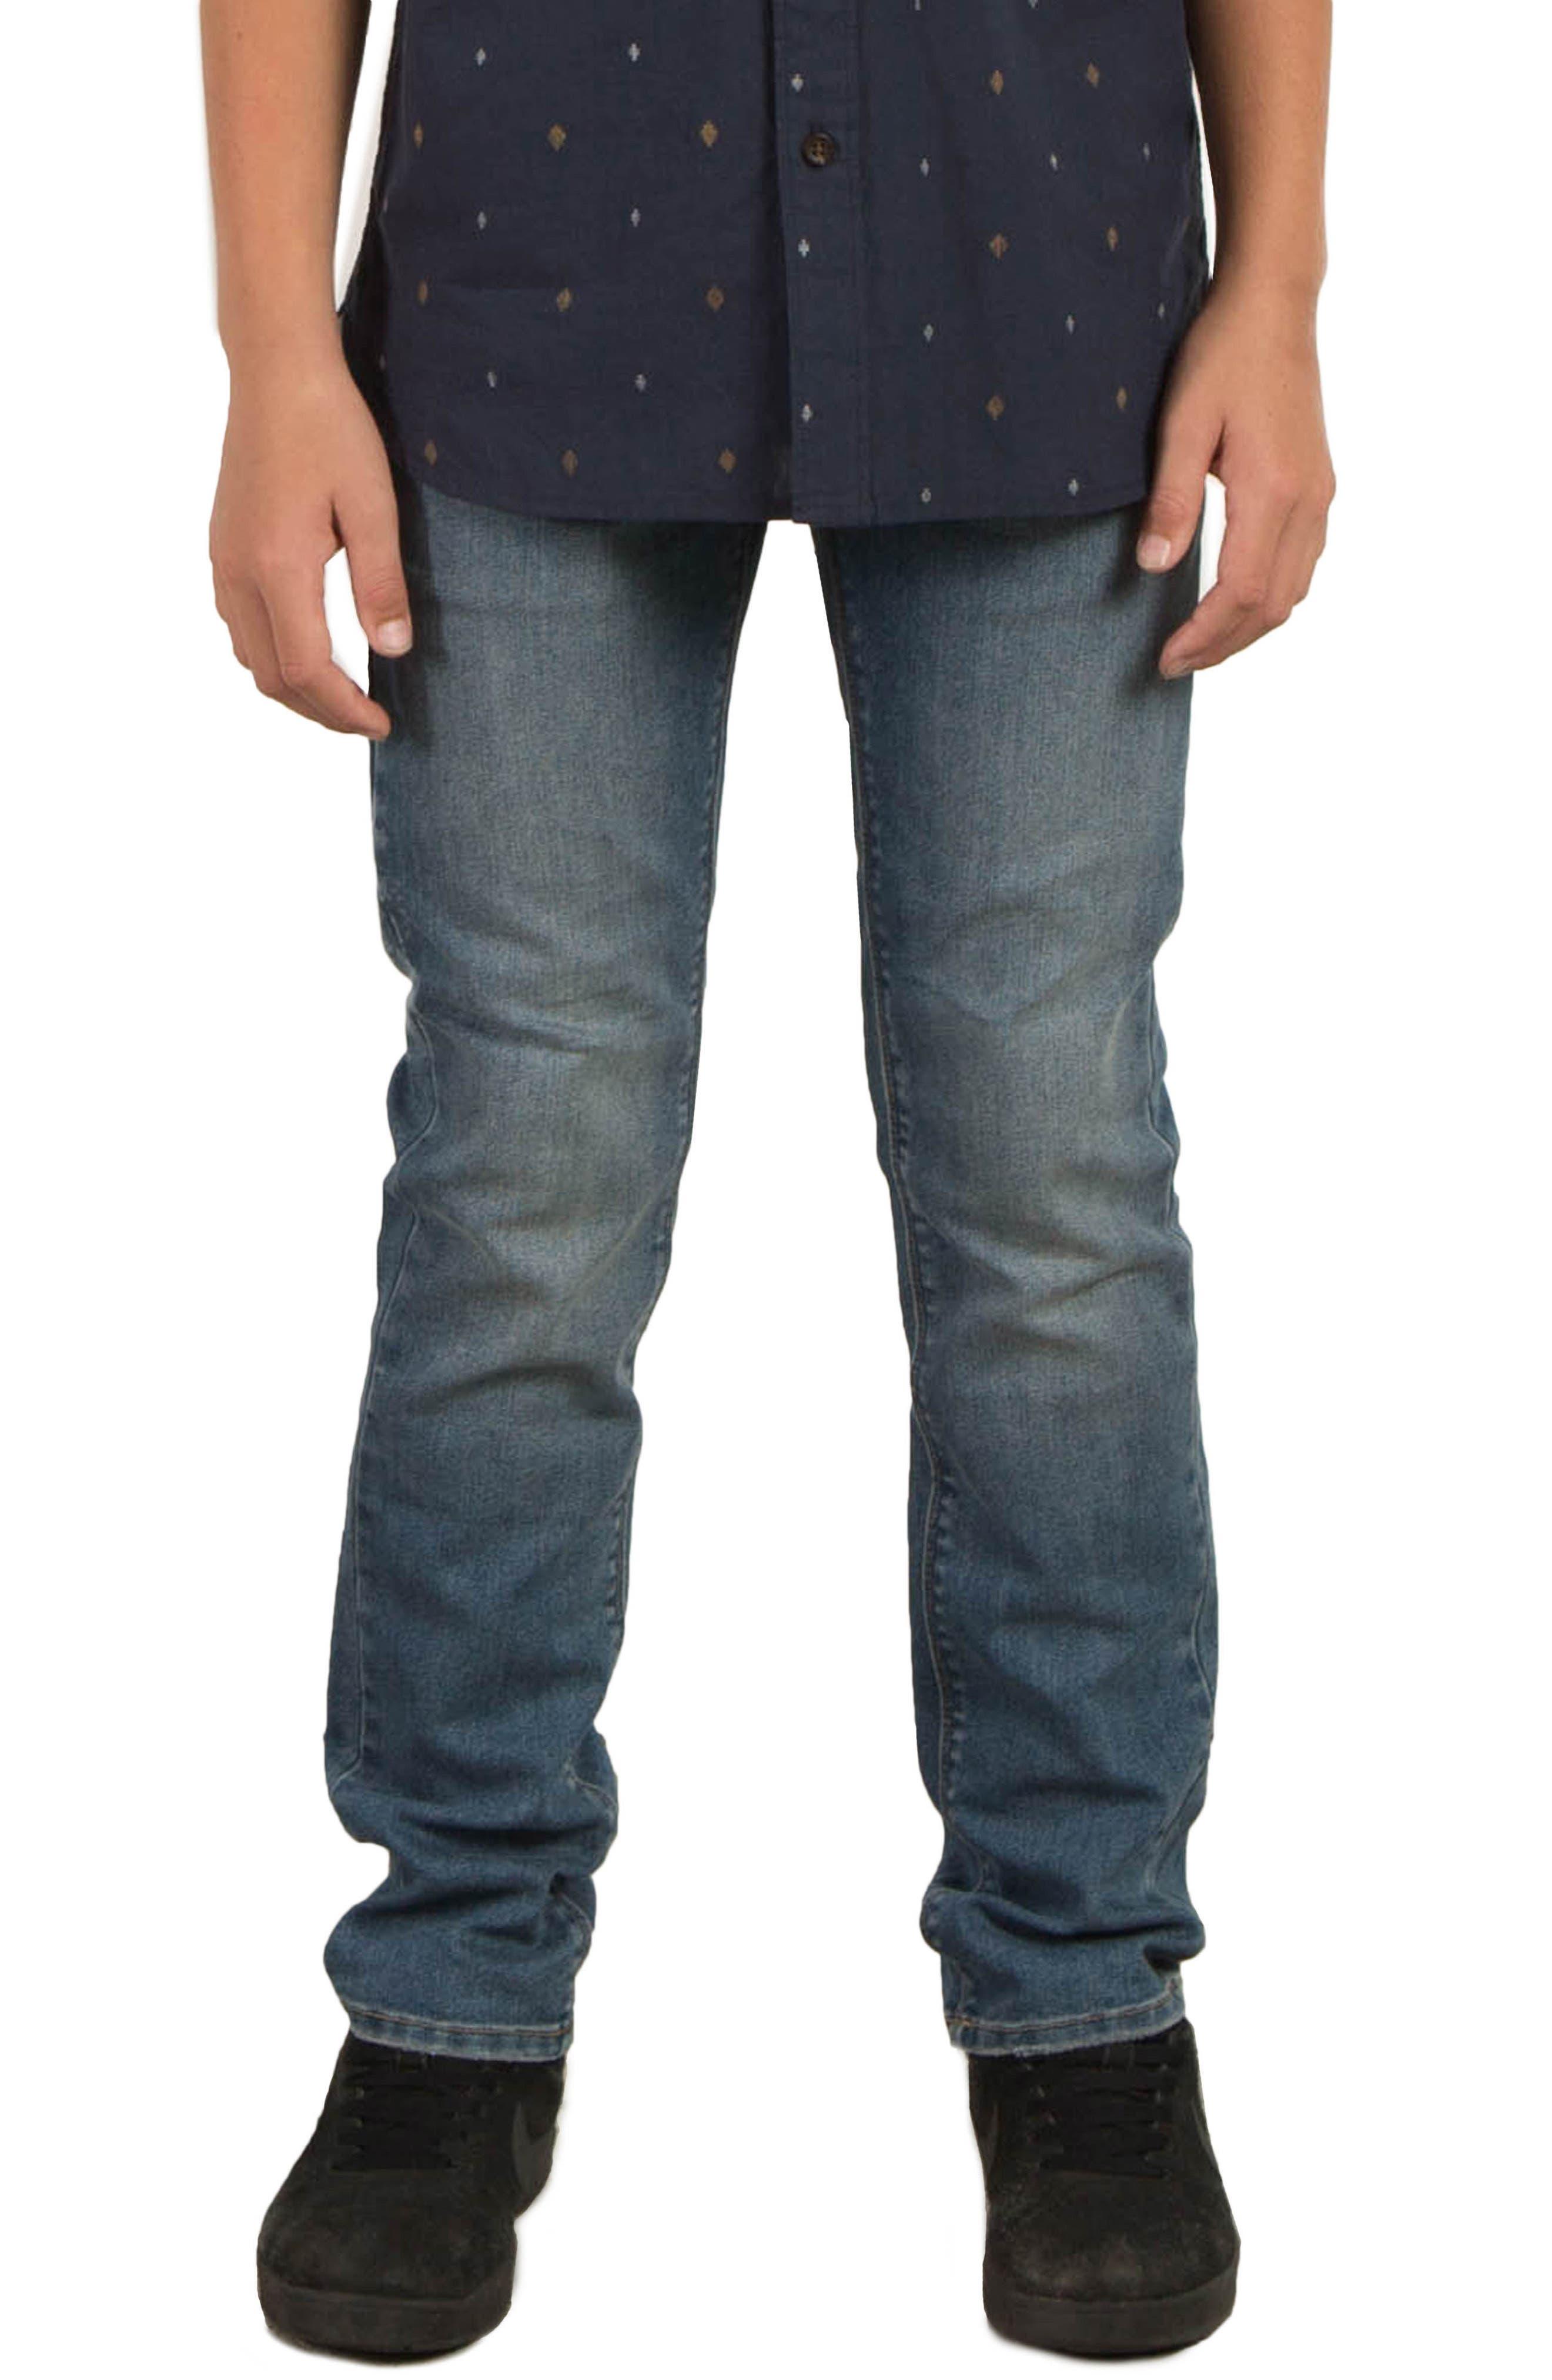 Vorta Slim Fit Jeans,                         Main,                         color, Baja Indigo